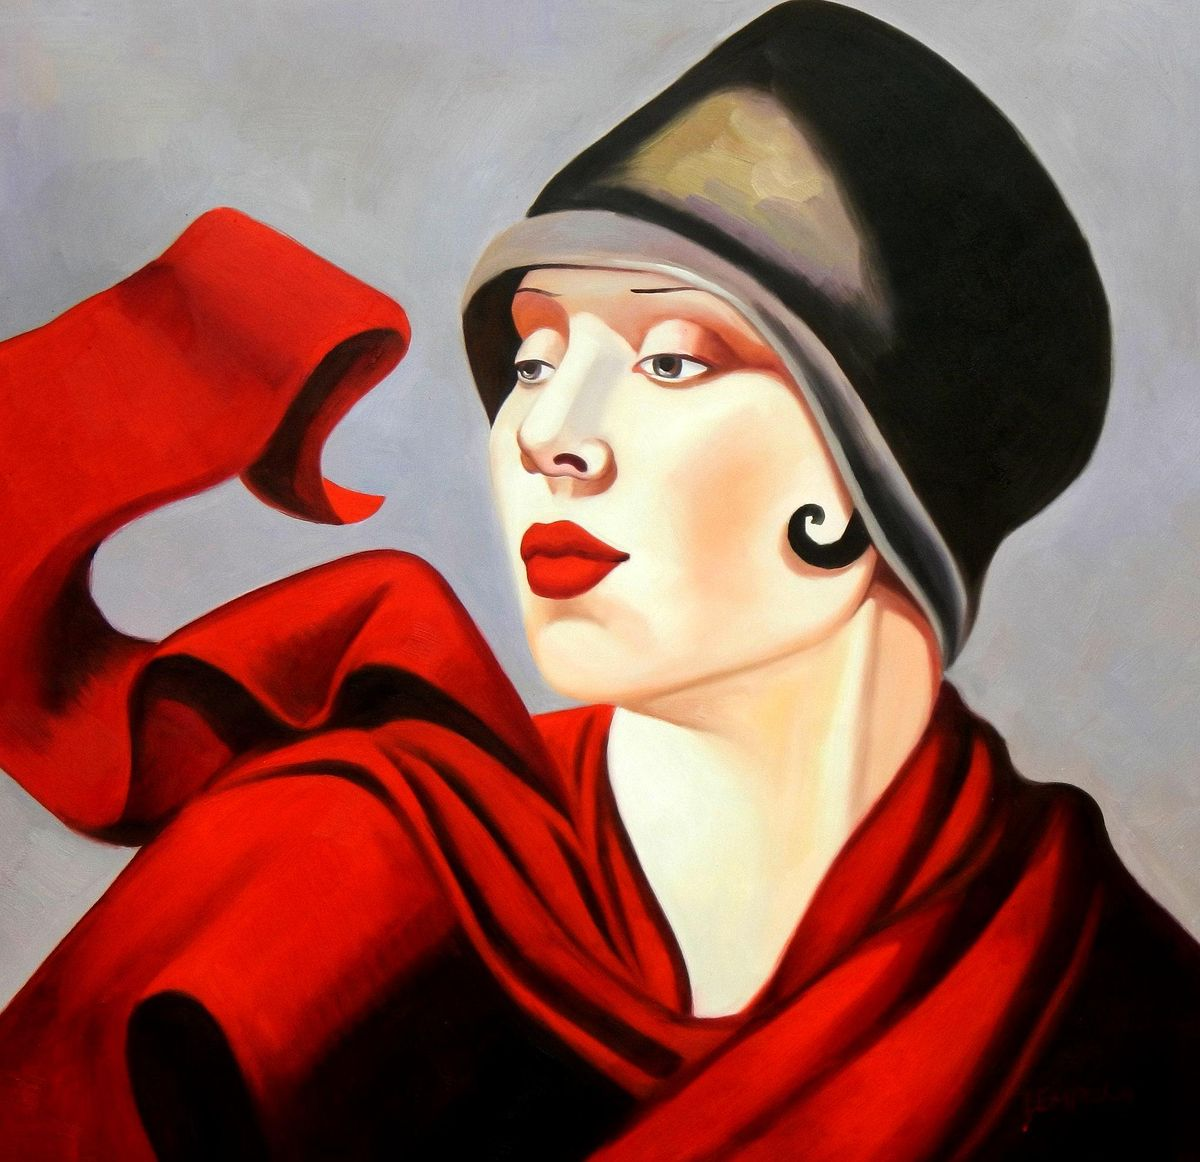 Homage of T. de Lempicka - Frau mit rotem Schal g94652 G 80x80cm exzellentes Ölbild